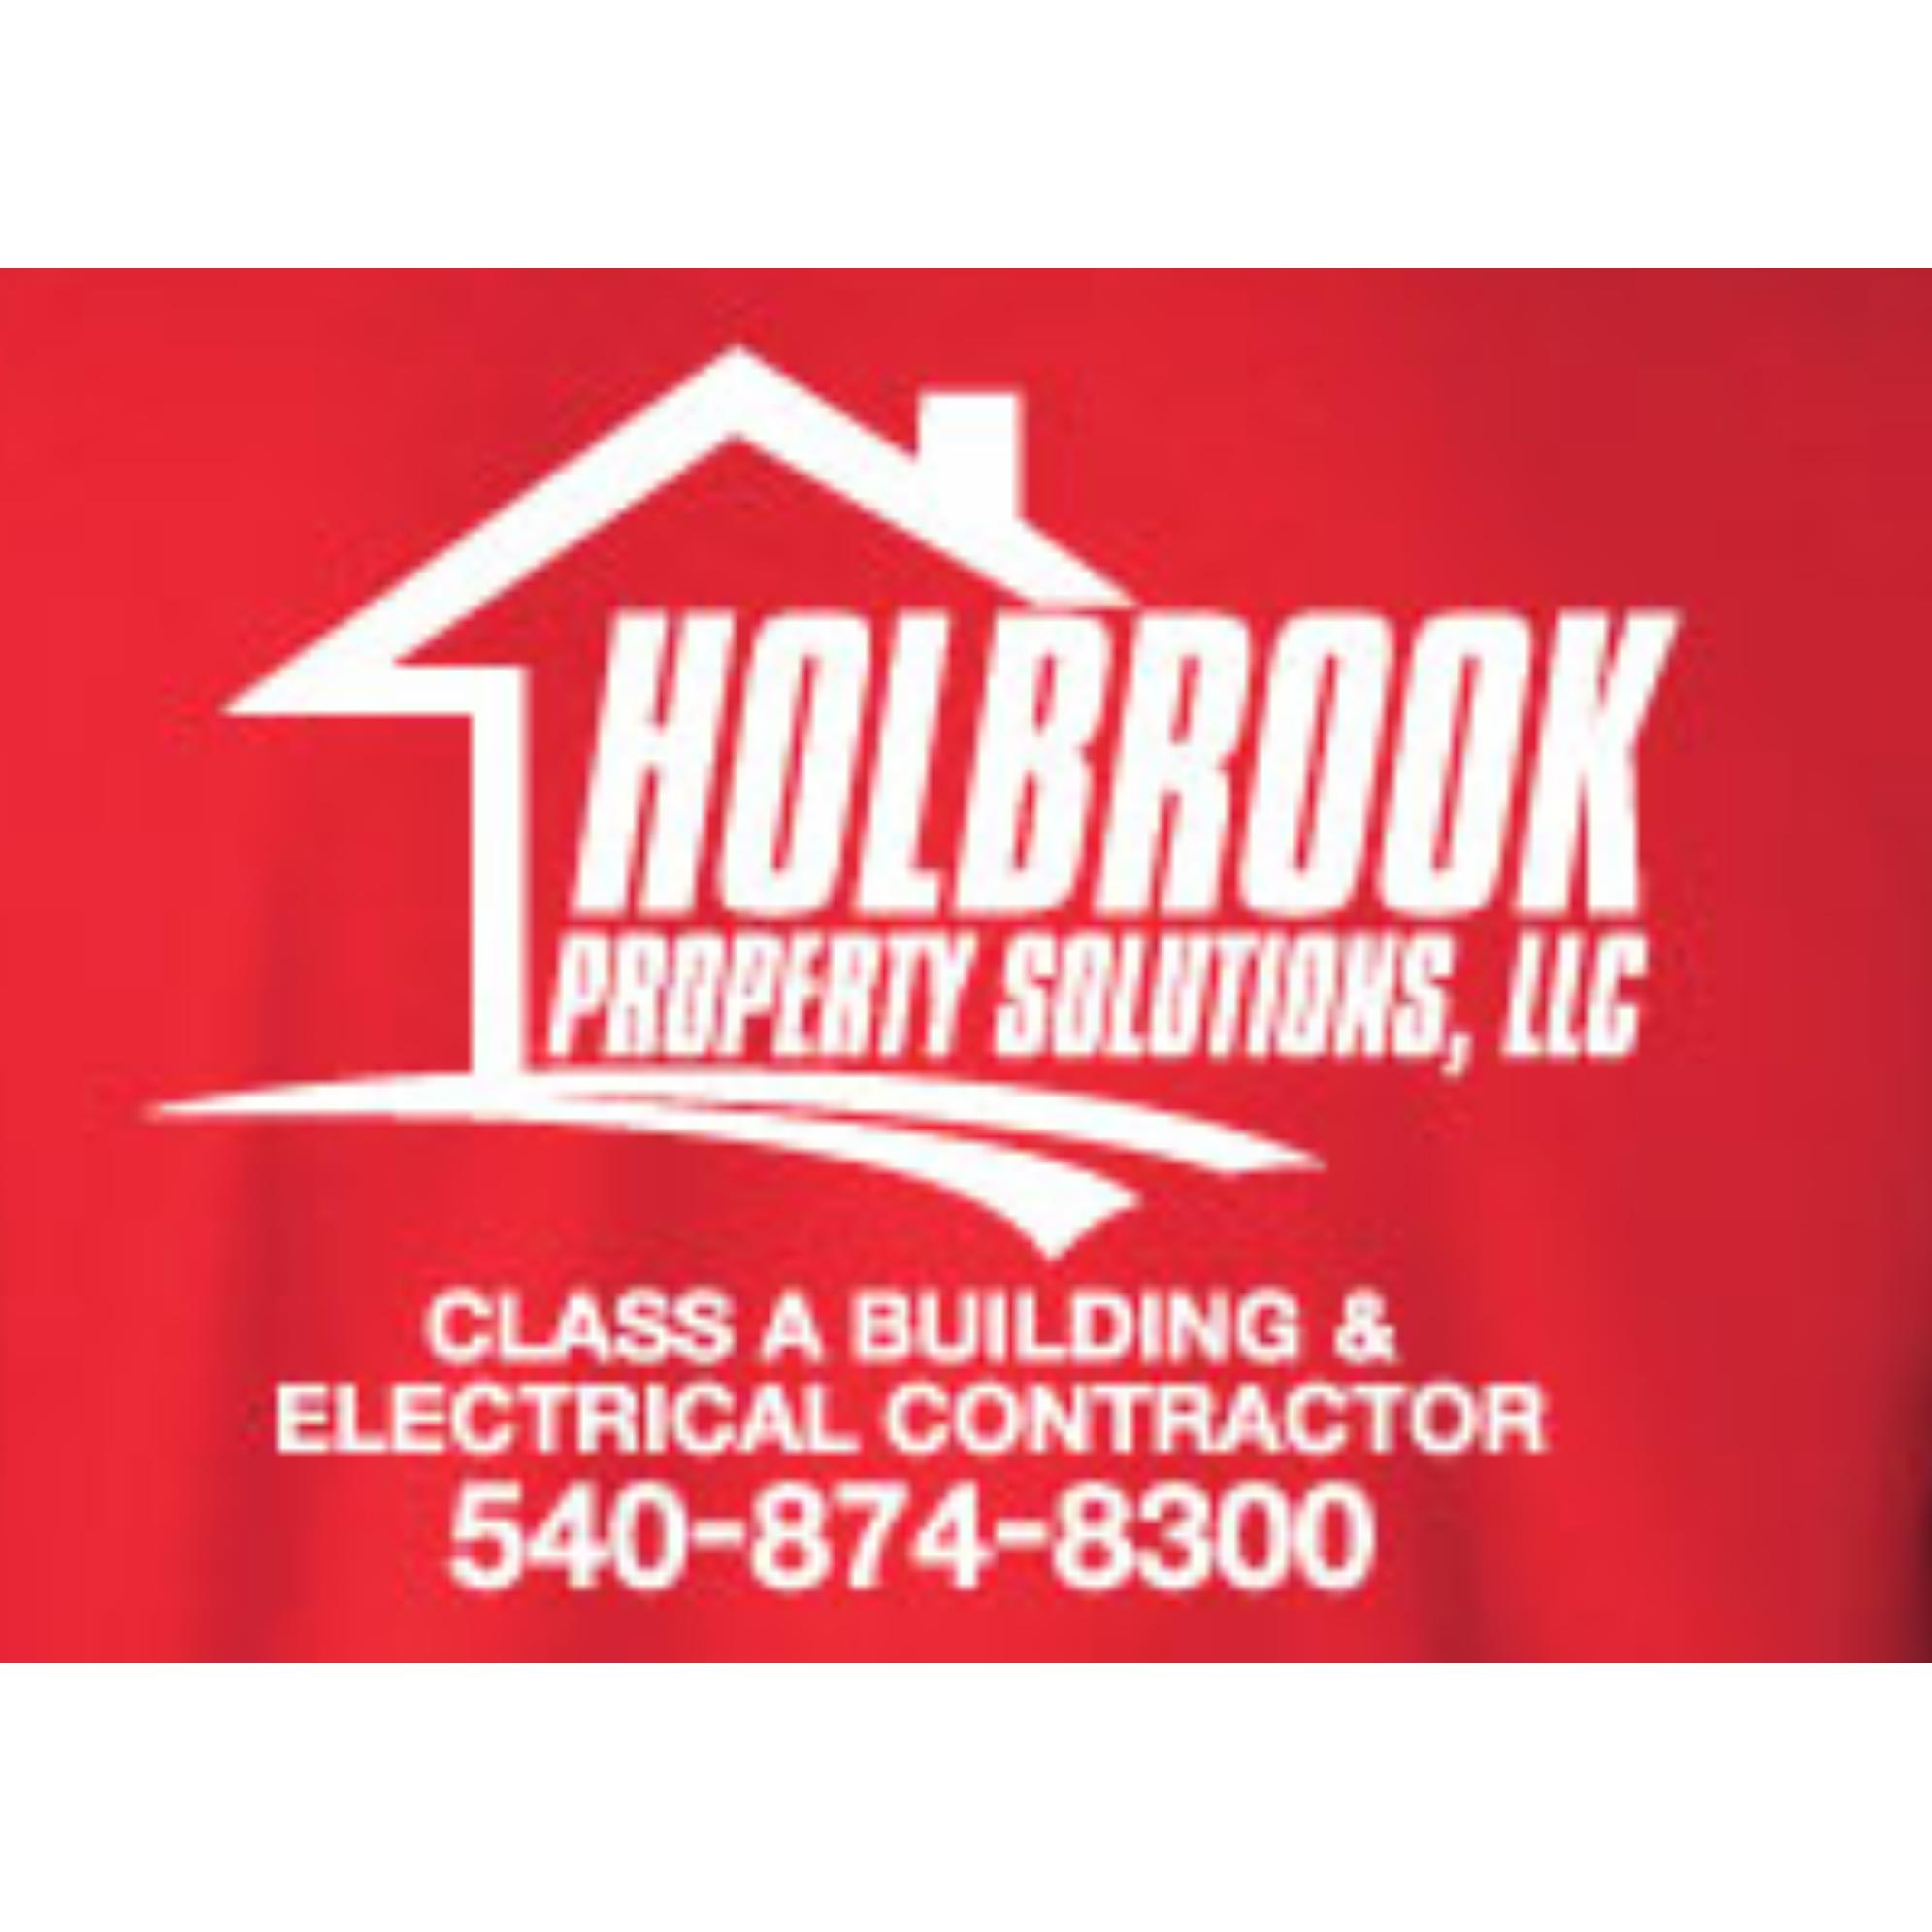 Holbrook Property Solutions